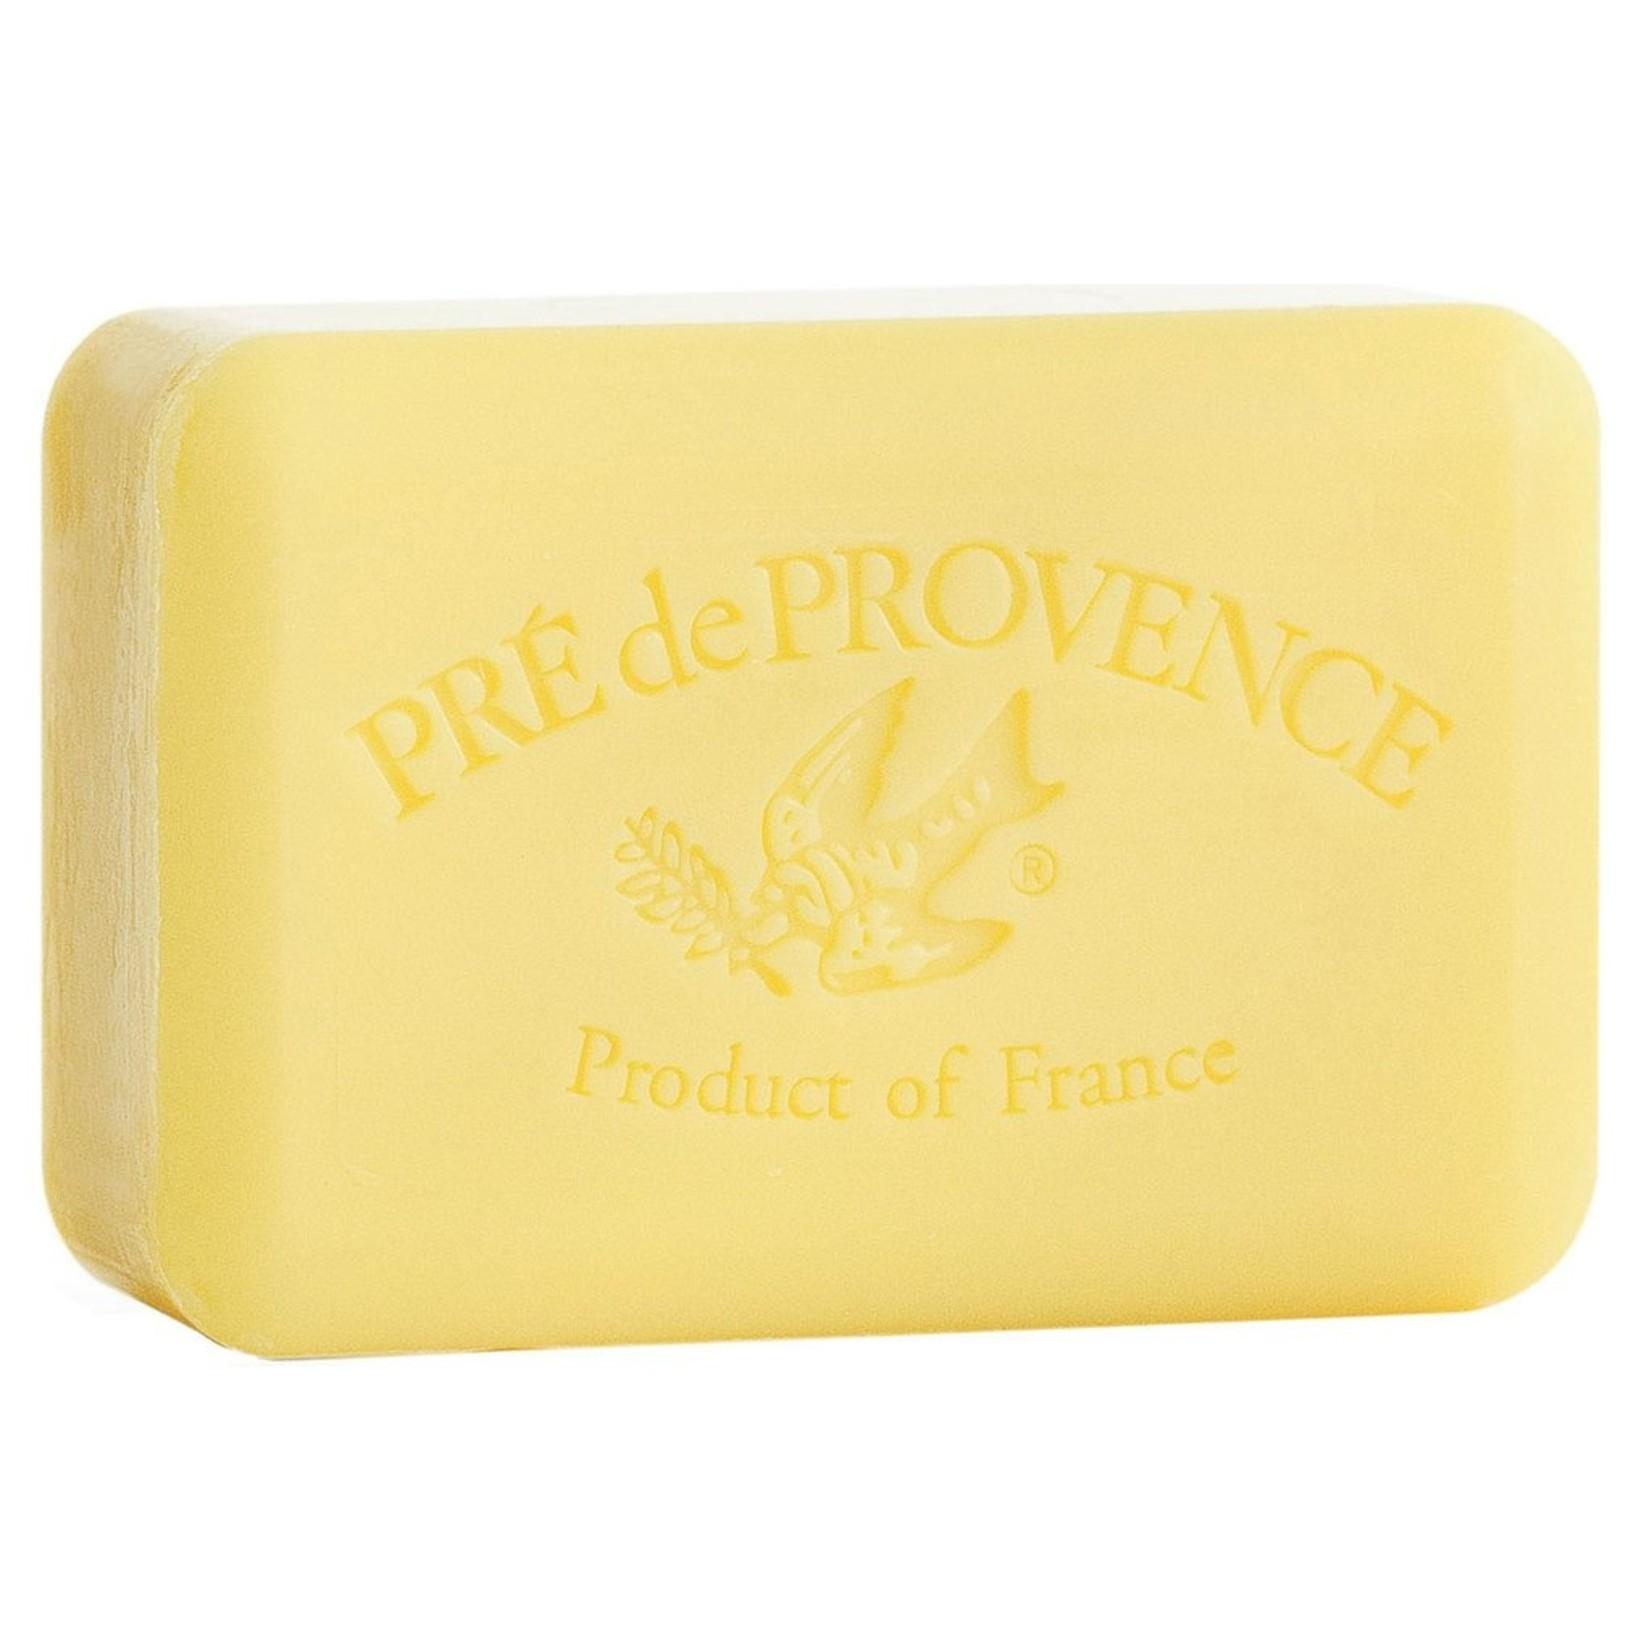 Pre de Provence Freesia Soap Bar